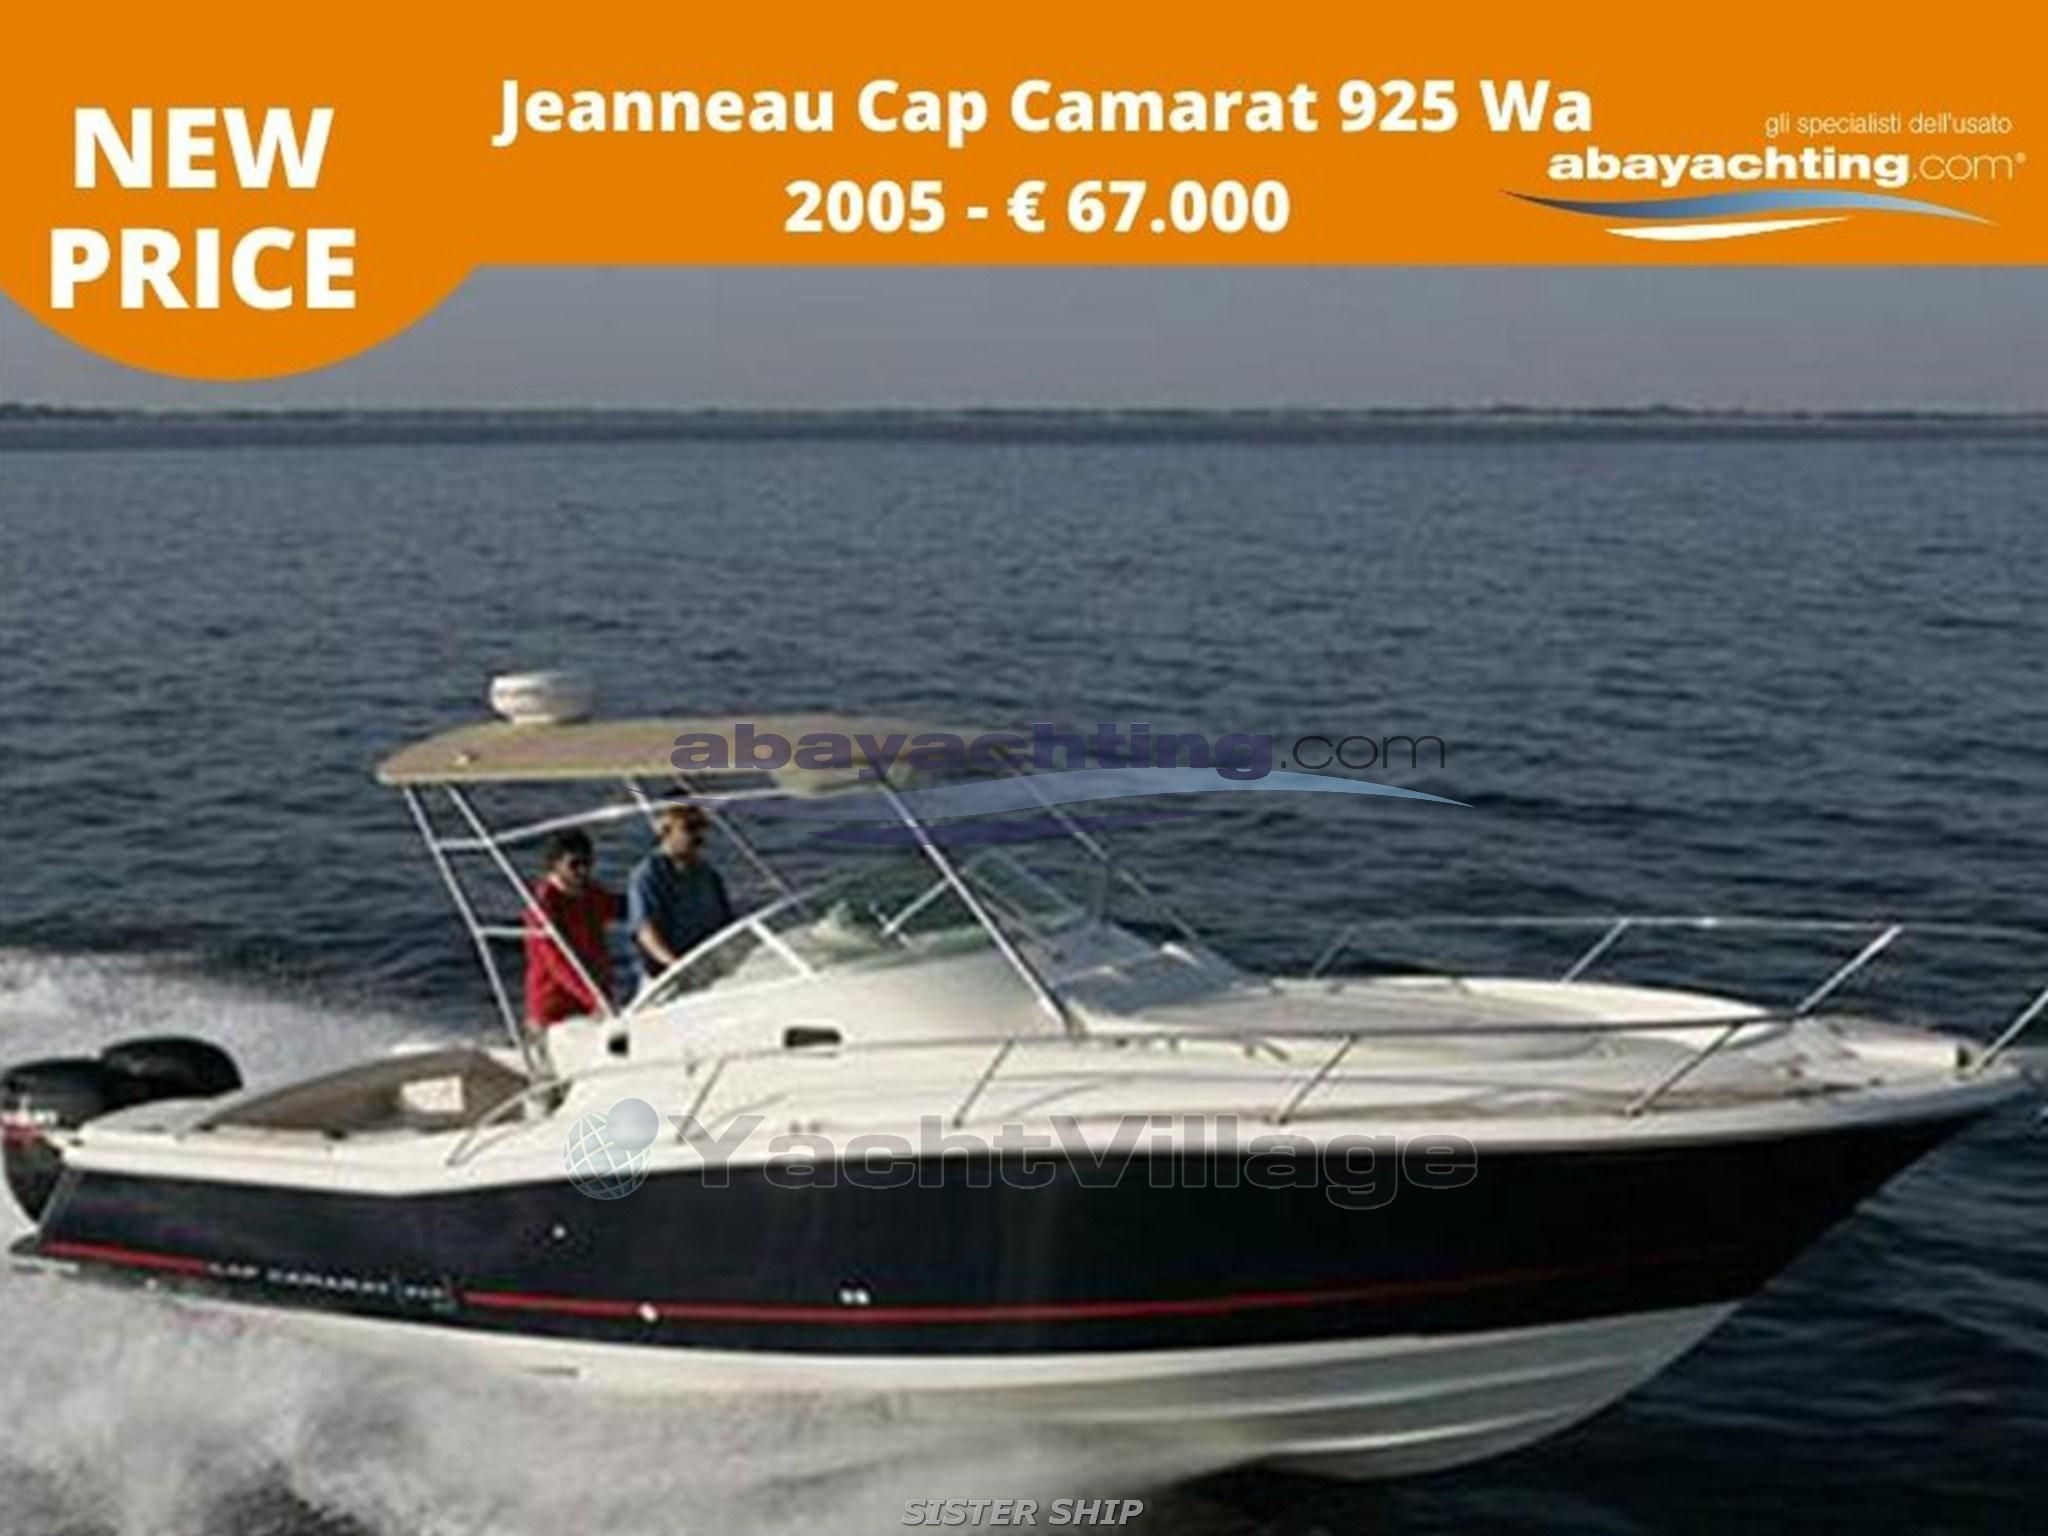 Jeanneau Cap Camarat 925 usato Abayachting